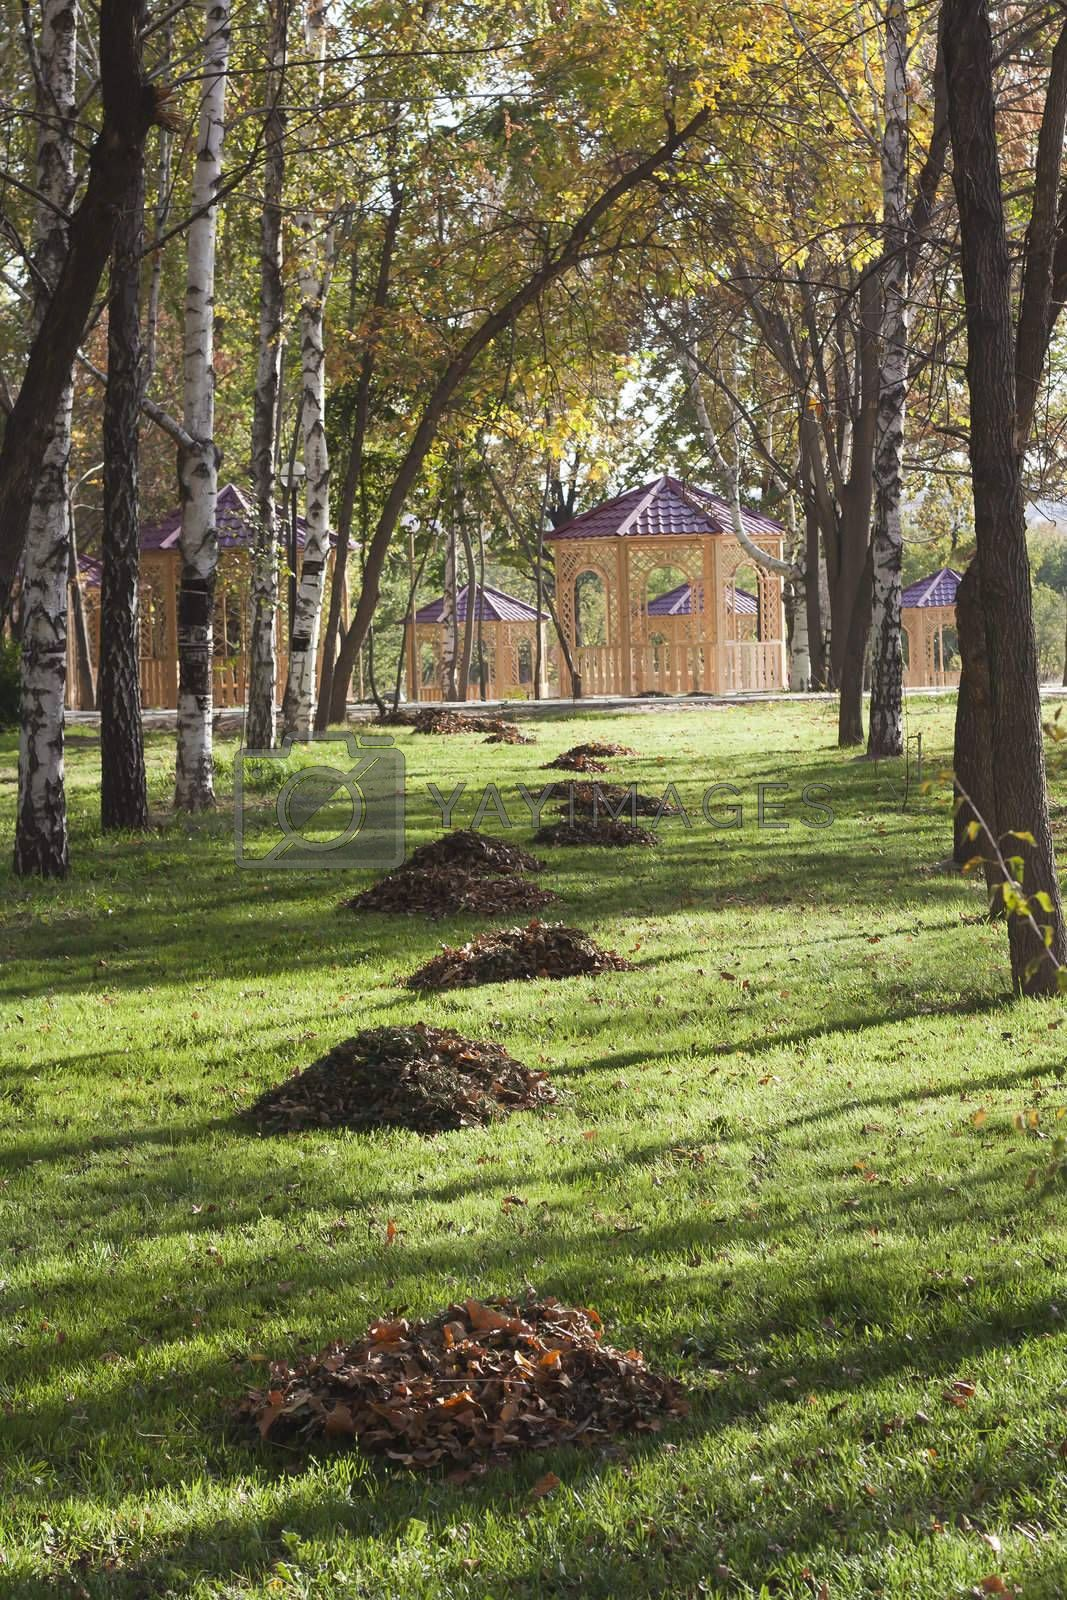 Vivid colors of autumn birch forest